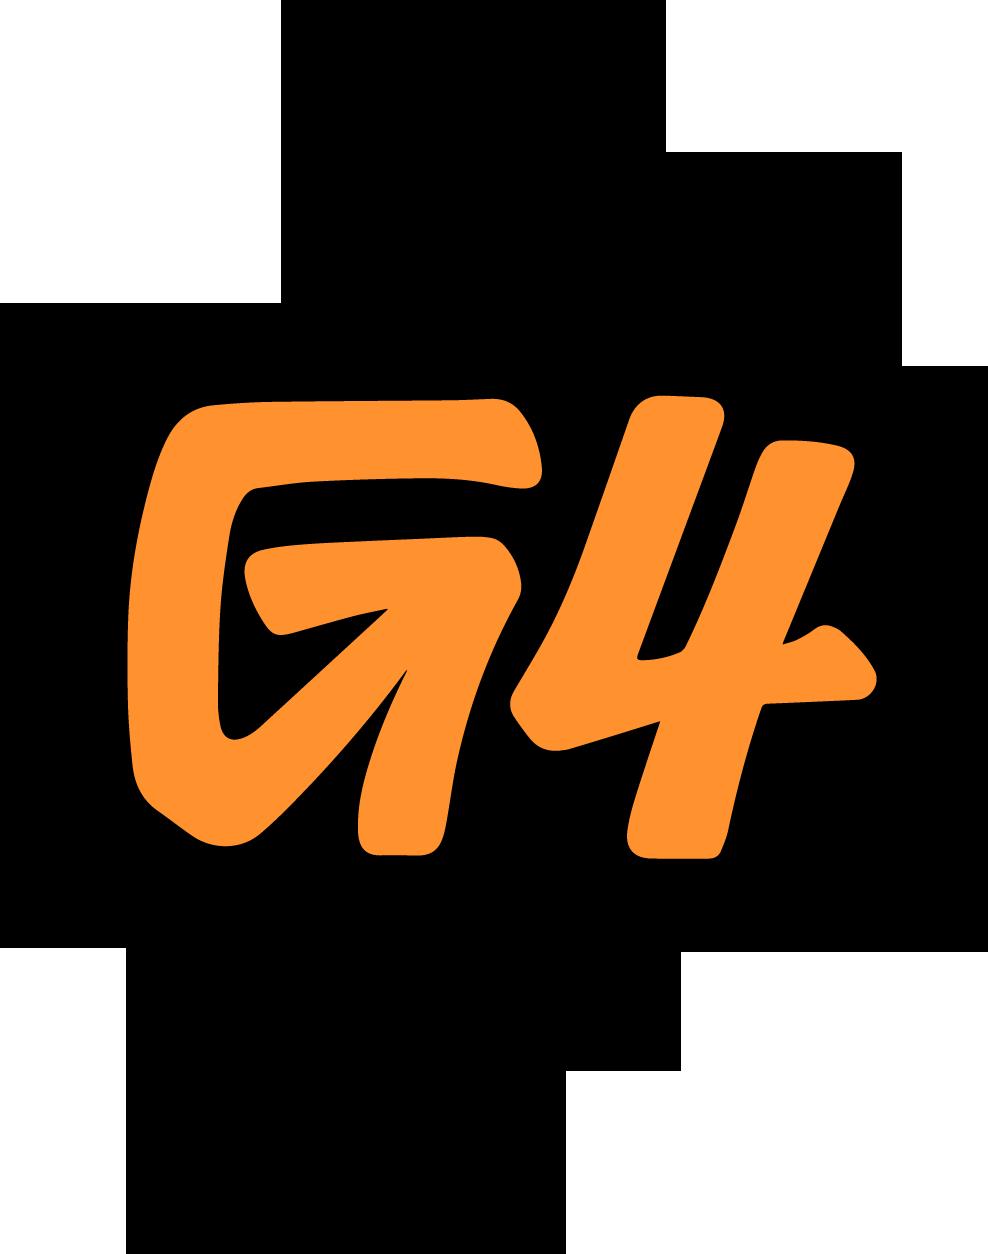 G4 (American TV network) - Wikipedia